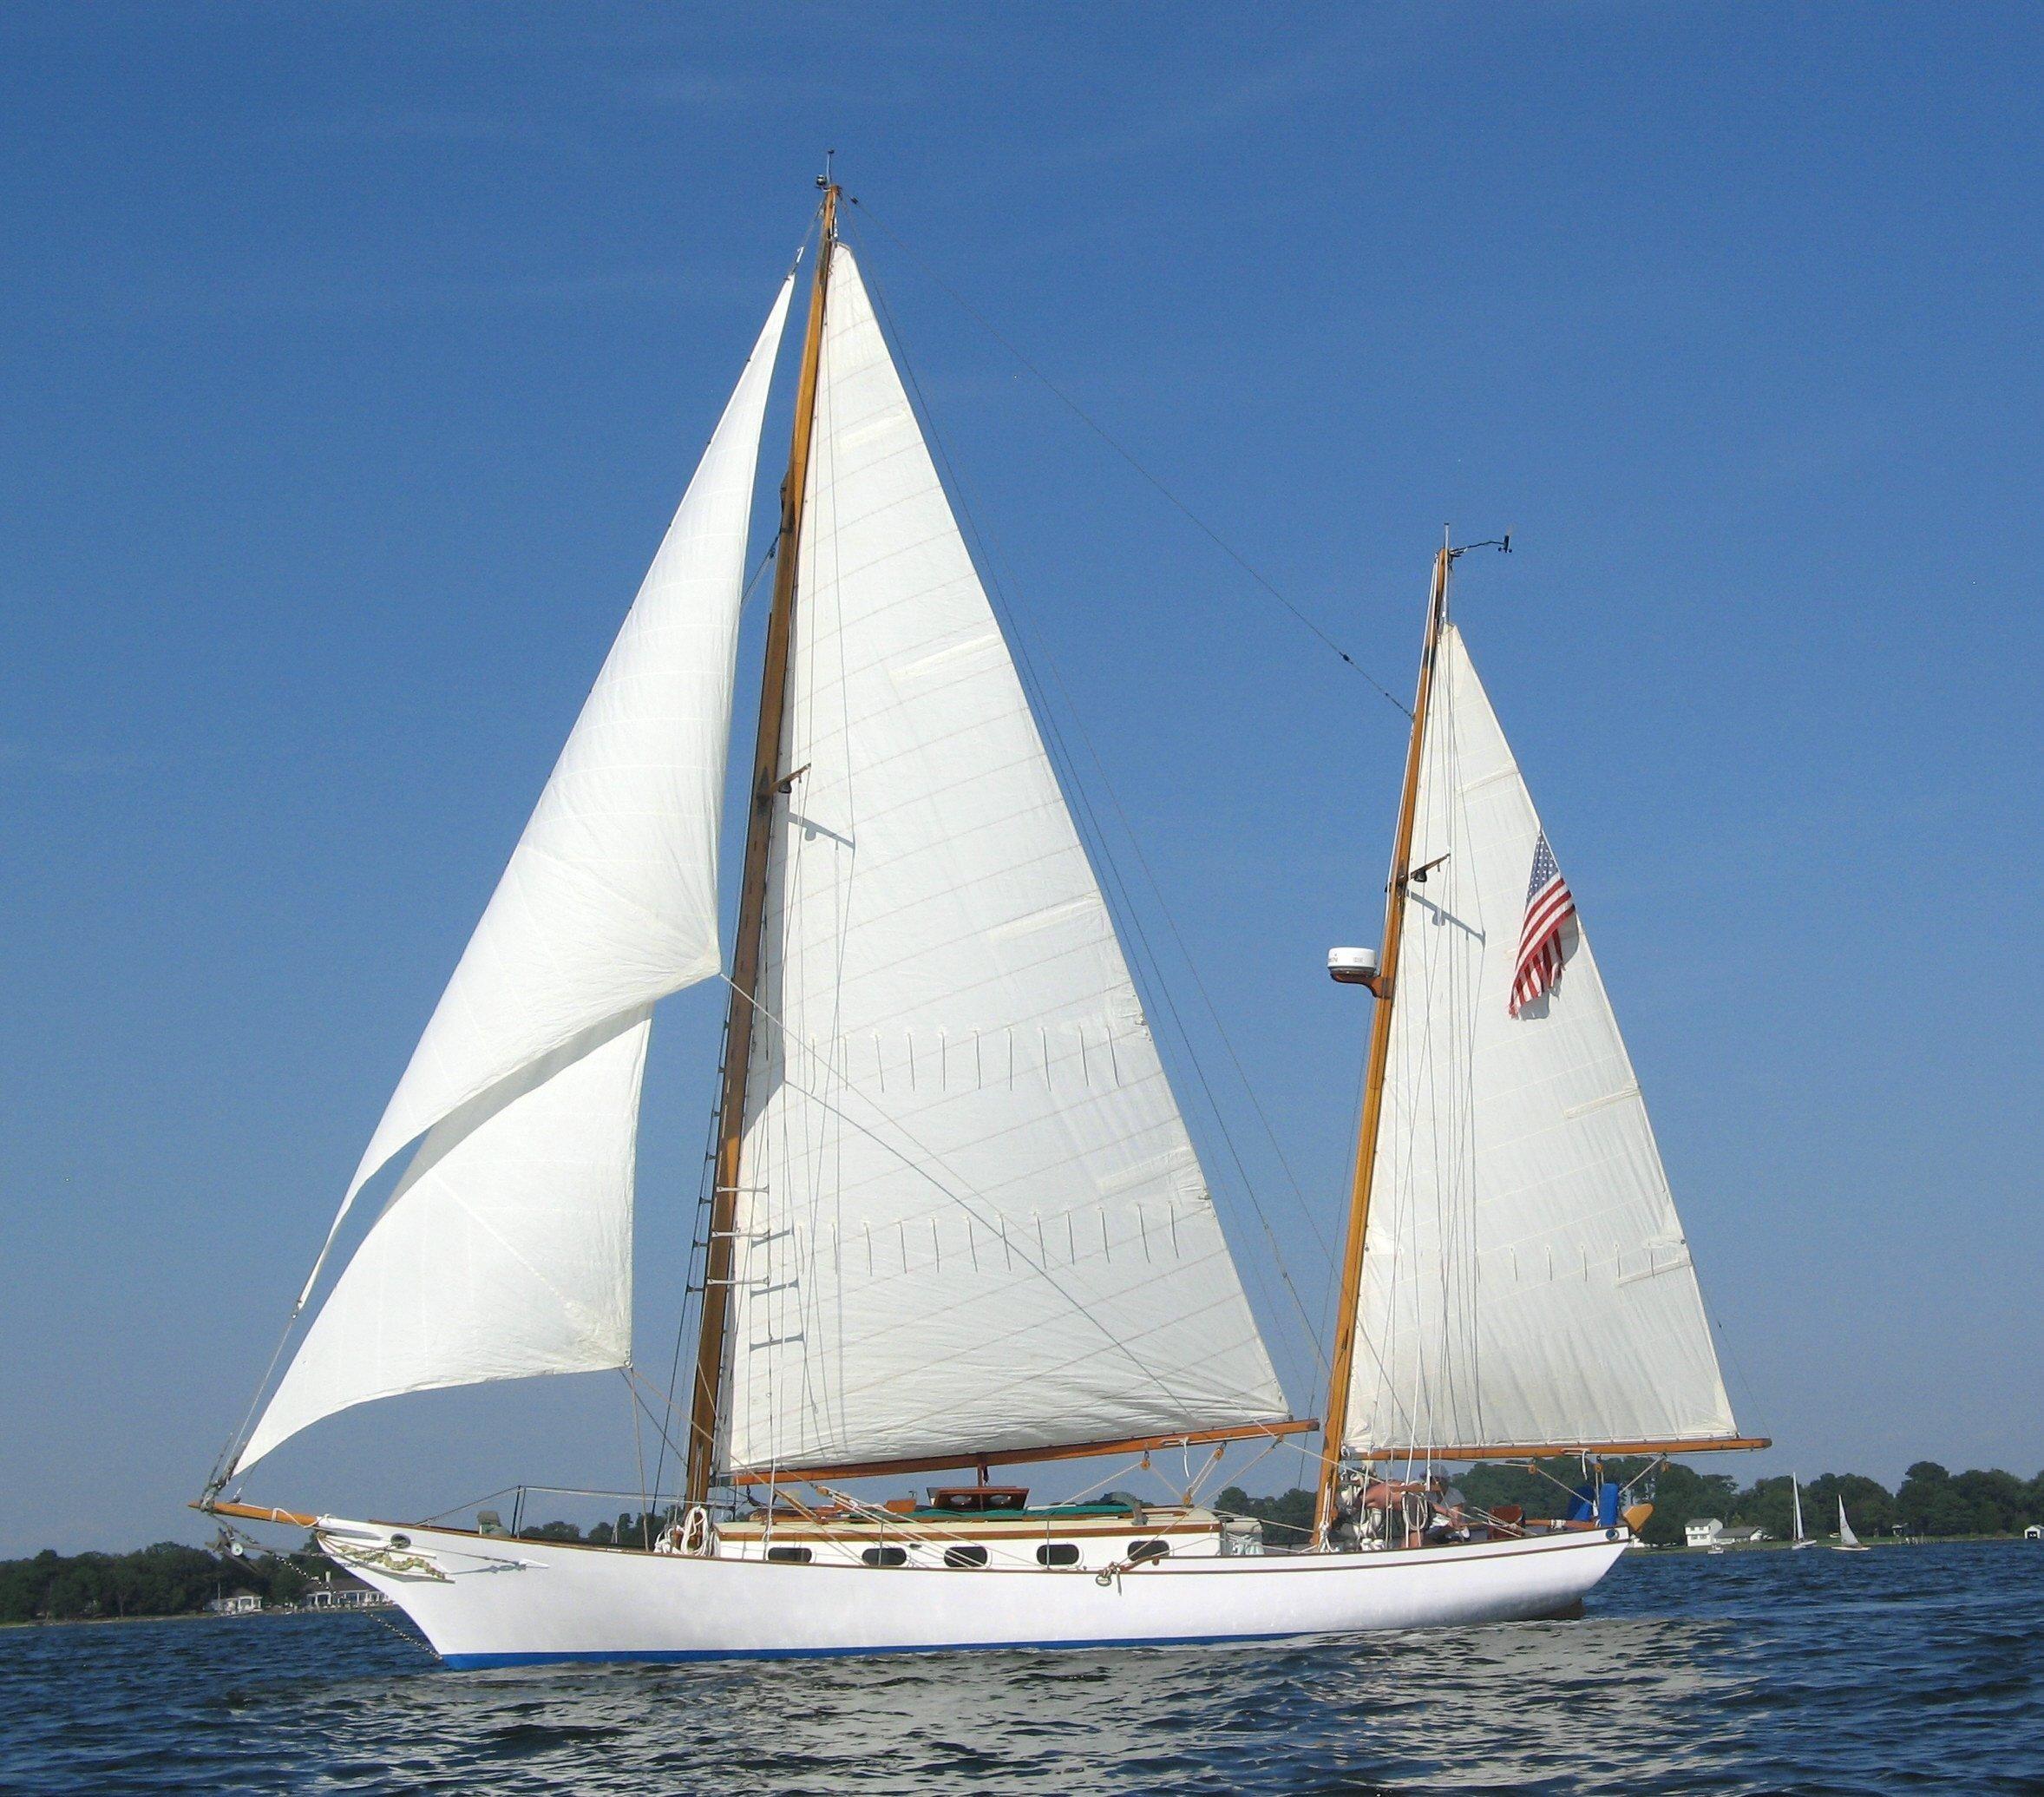 1970 Herreshoff Nereia Sail Boat For Sale Www Yachtworld Com